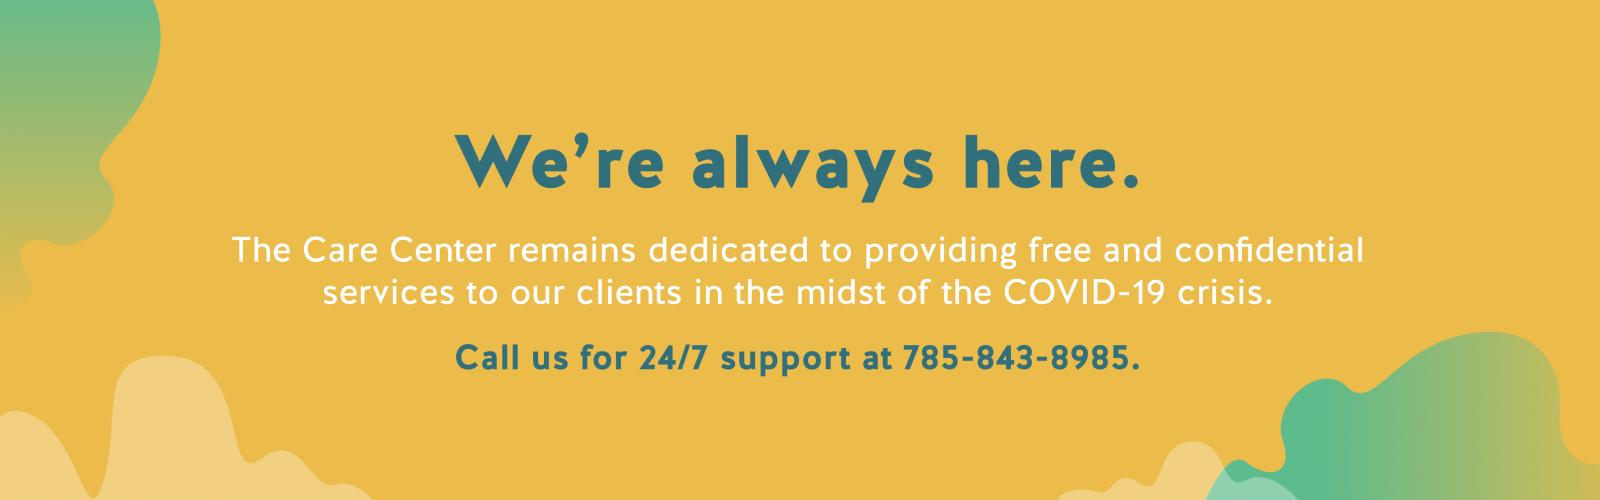 covid19update care center